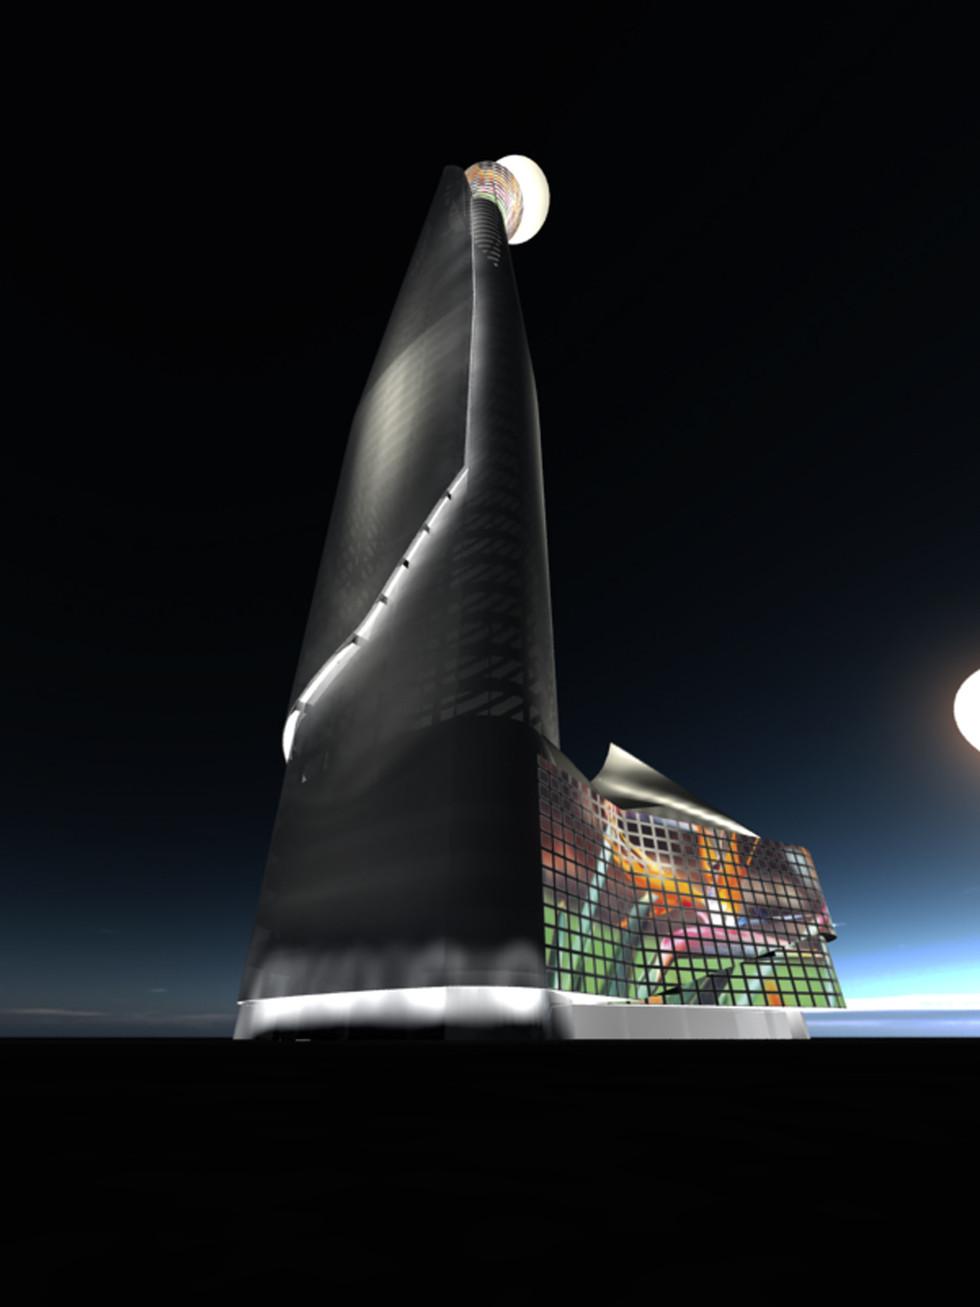 HCMC Bitexico Financial Tower